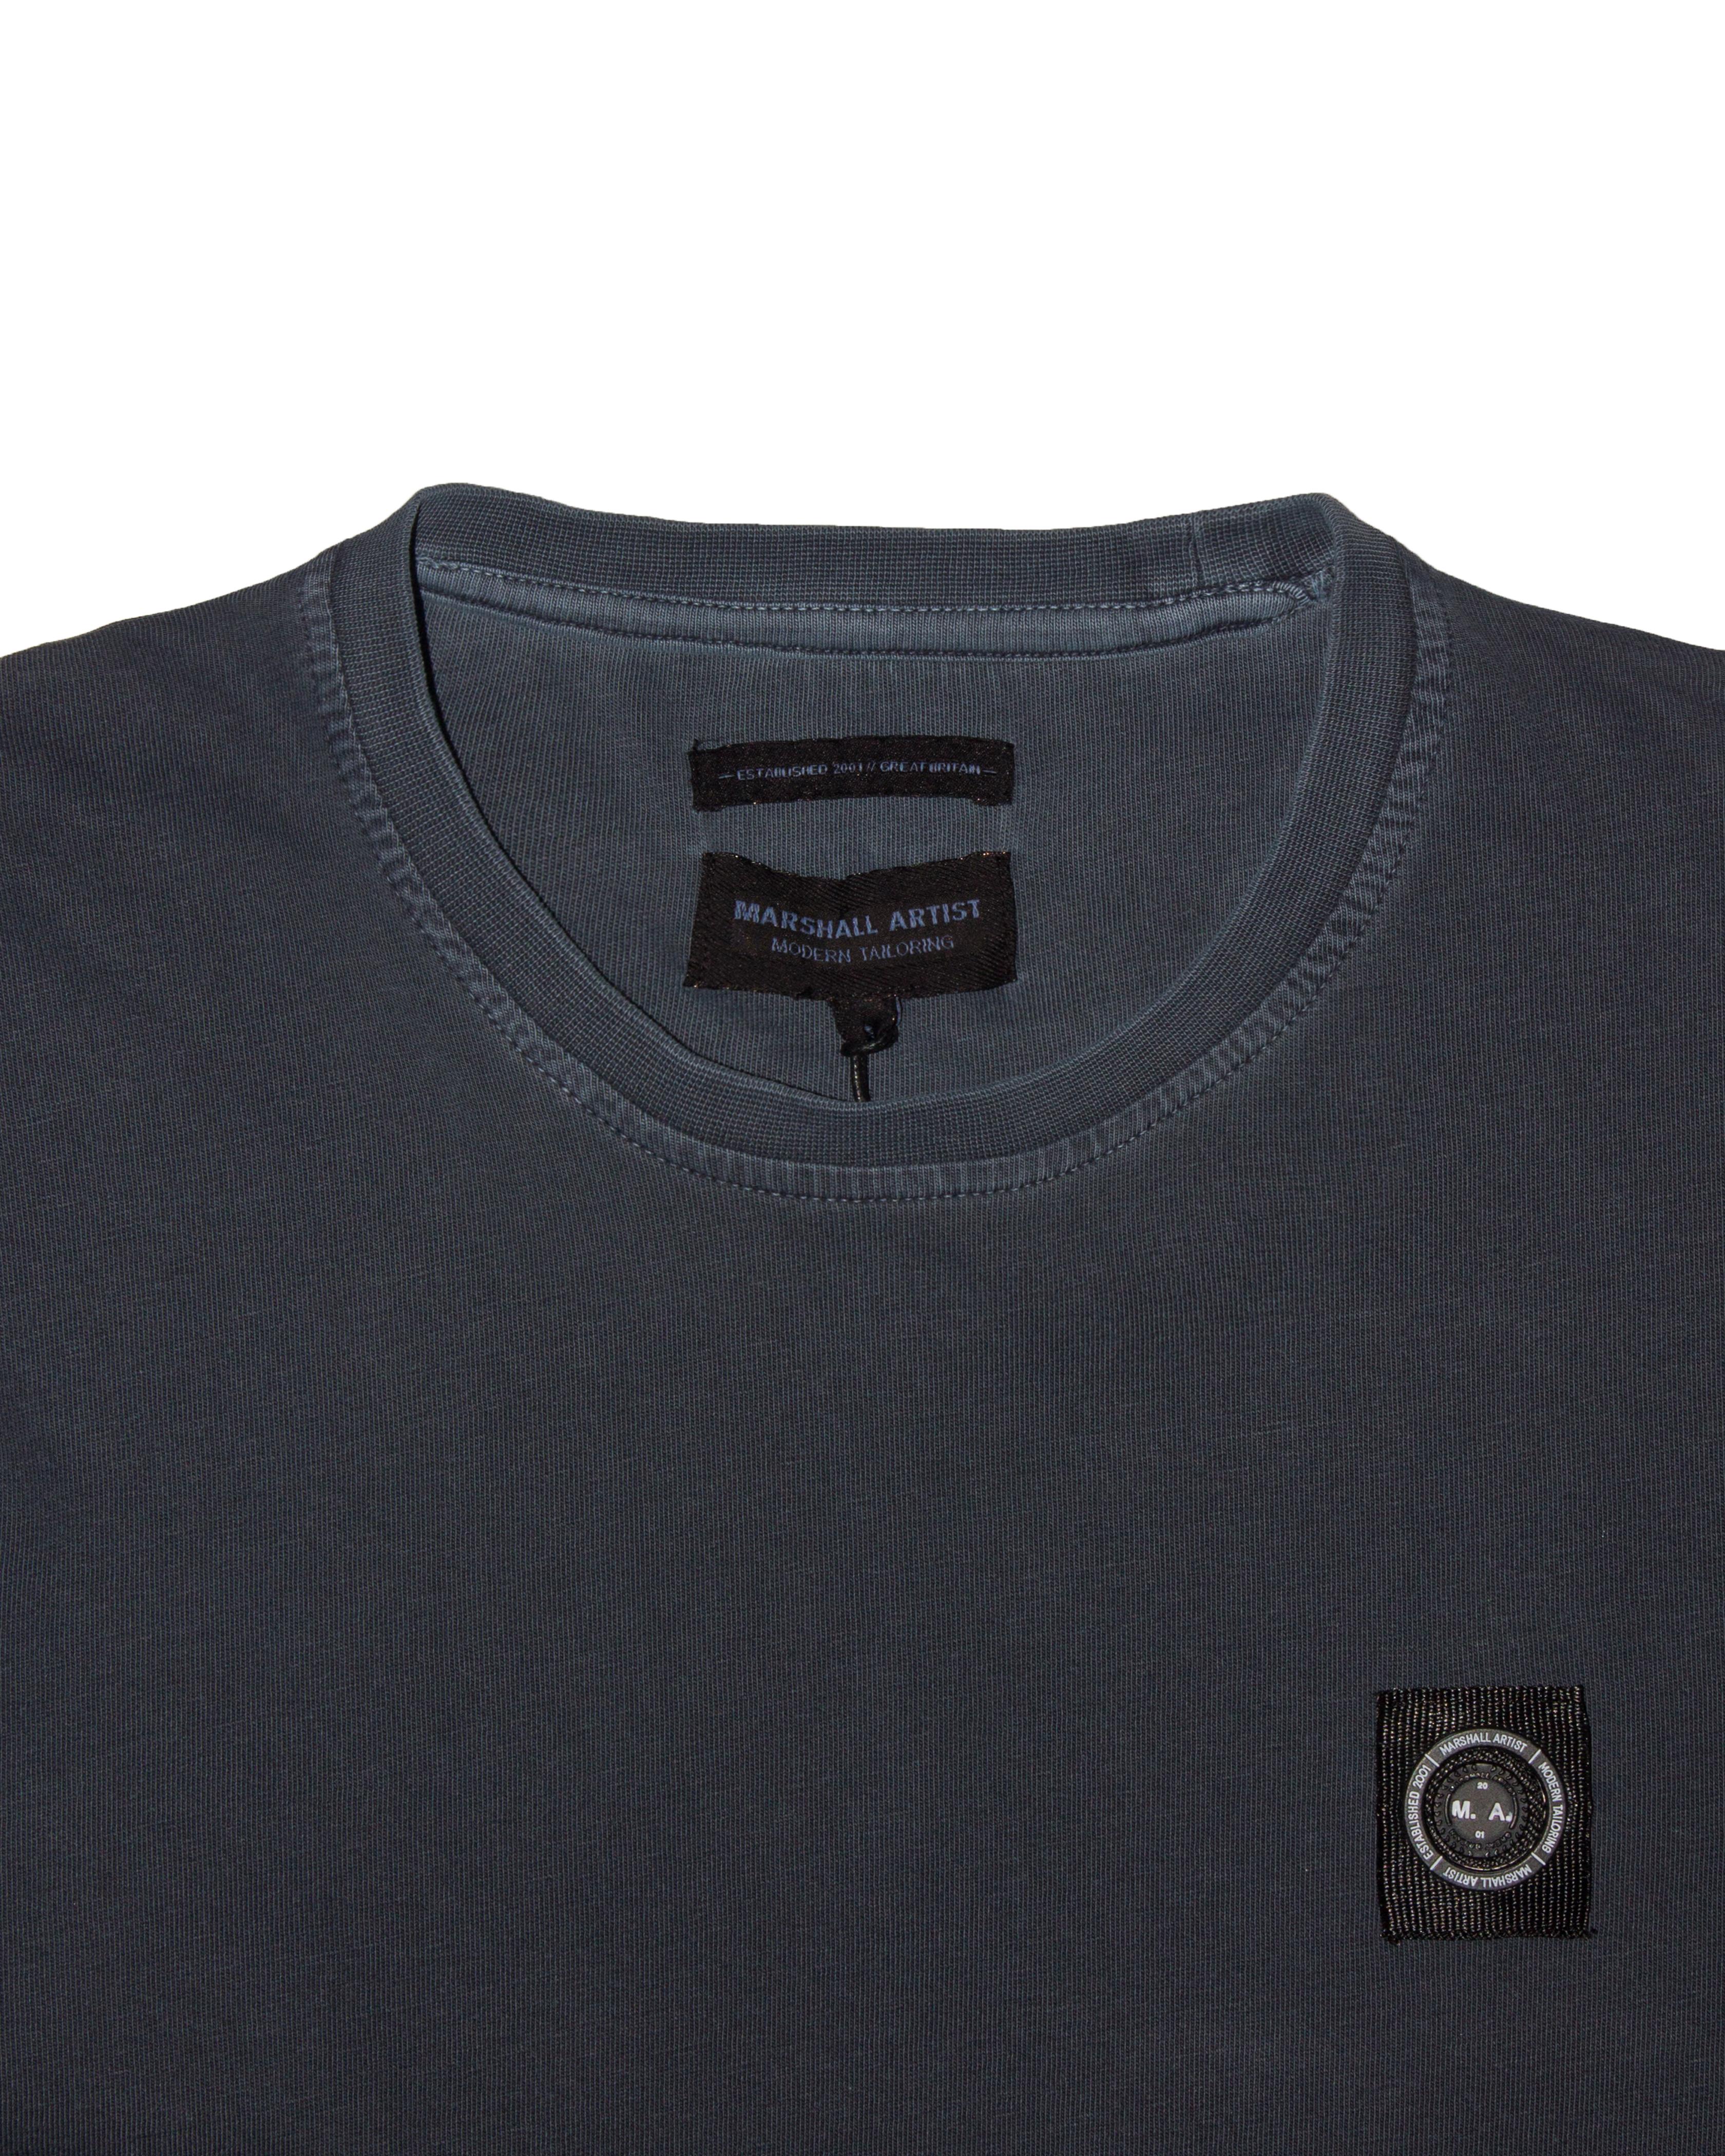 Футболка Marshall Artist Garment Dyed Navy Tee